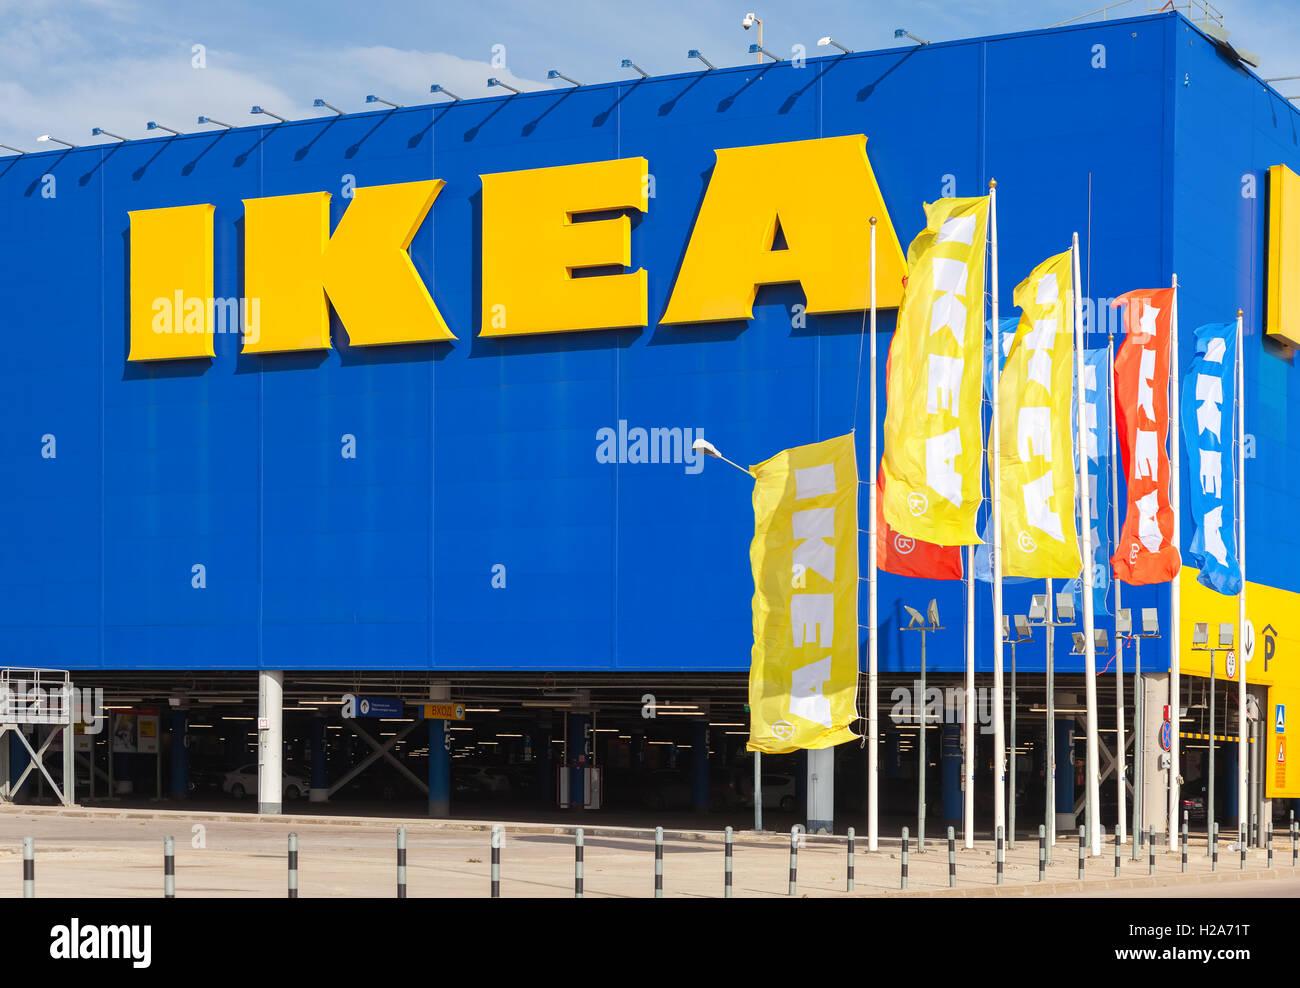 IKEA flags near the IKEA Samara Store. IKEA is the world's largest furniture retailer. It w - Stock Image